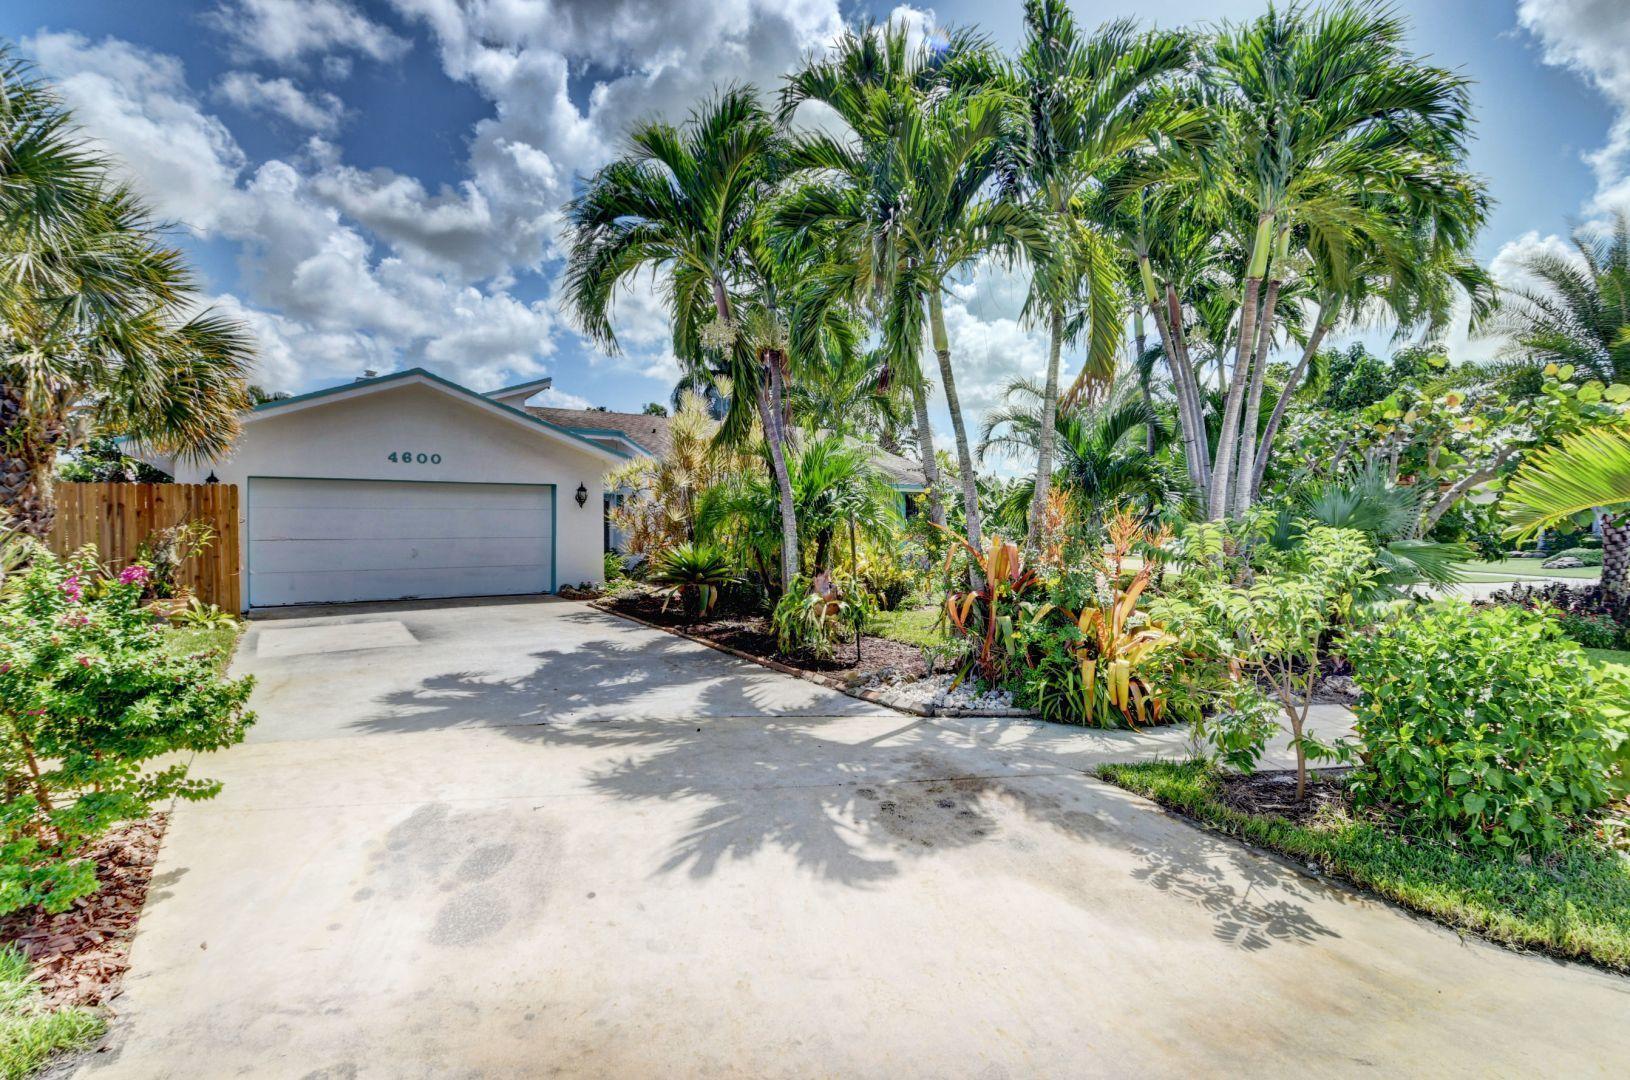 4600 Cypress Knee Drive Boca Raton, FL 33487